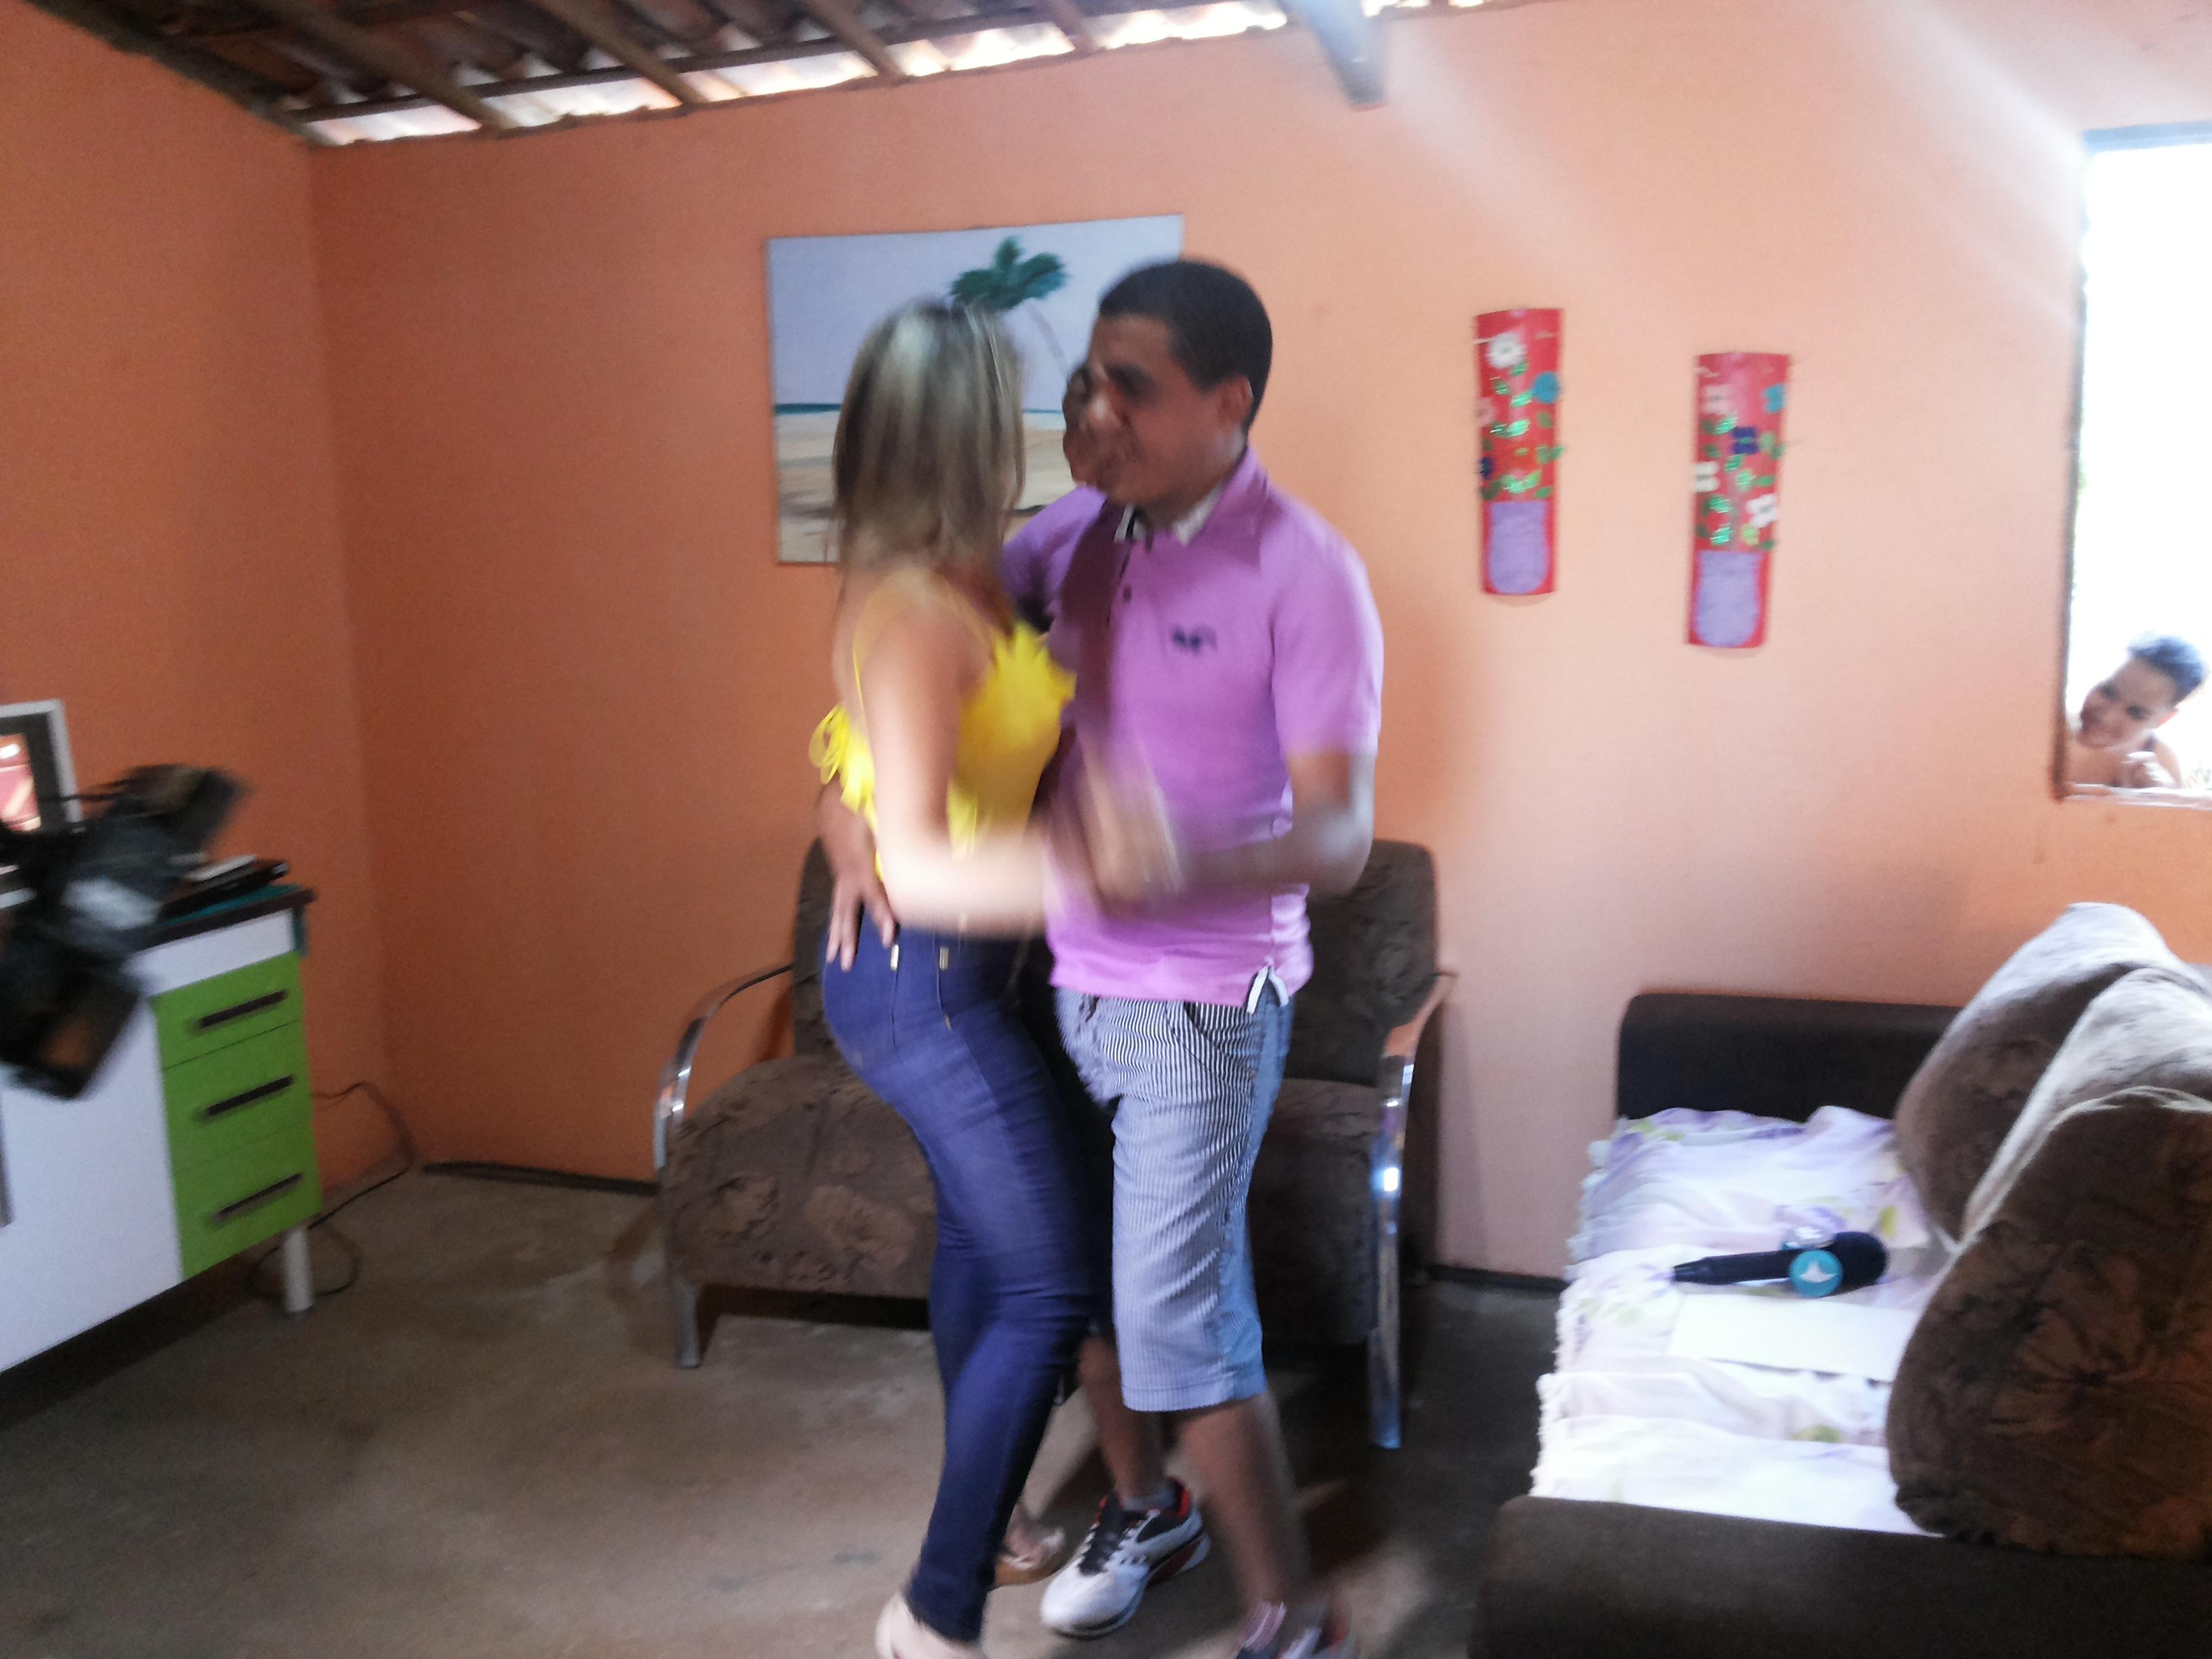 15-11-24 Lorrane Cabral conta a história de Erivando Braga no Gente na TV. Foto Dadynha Saturnino (14)